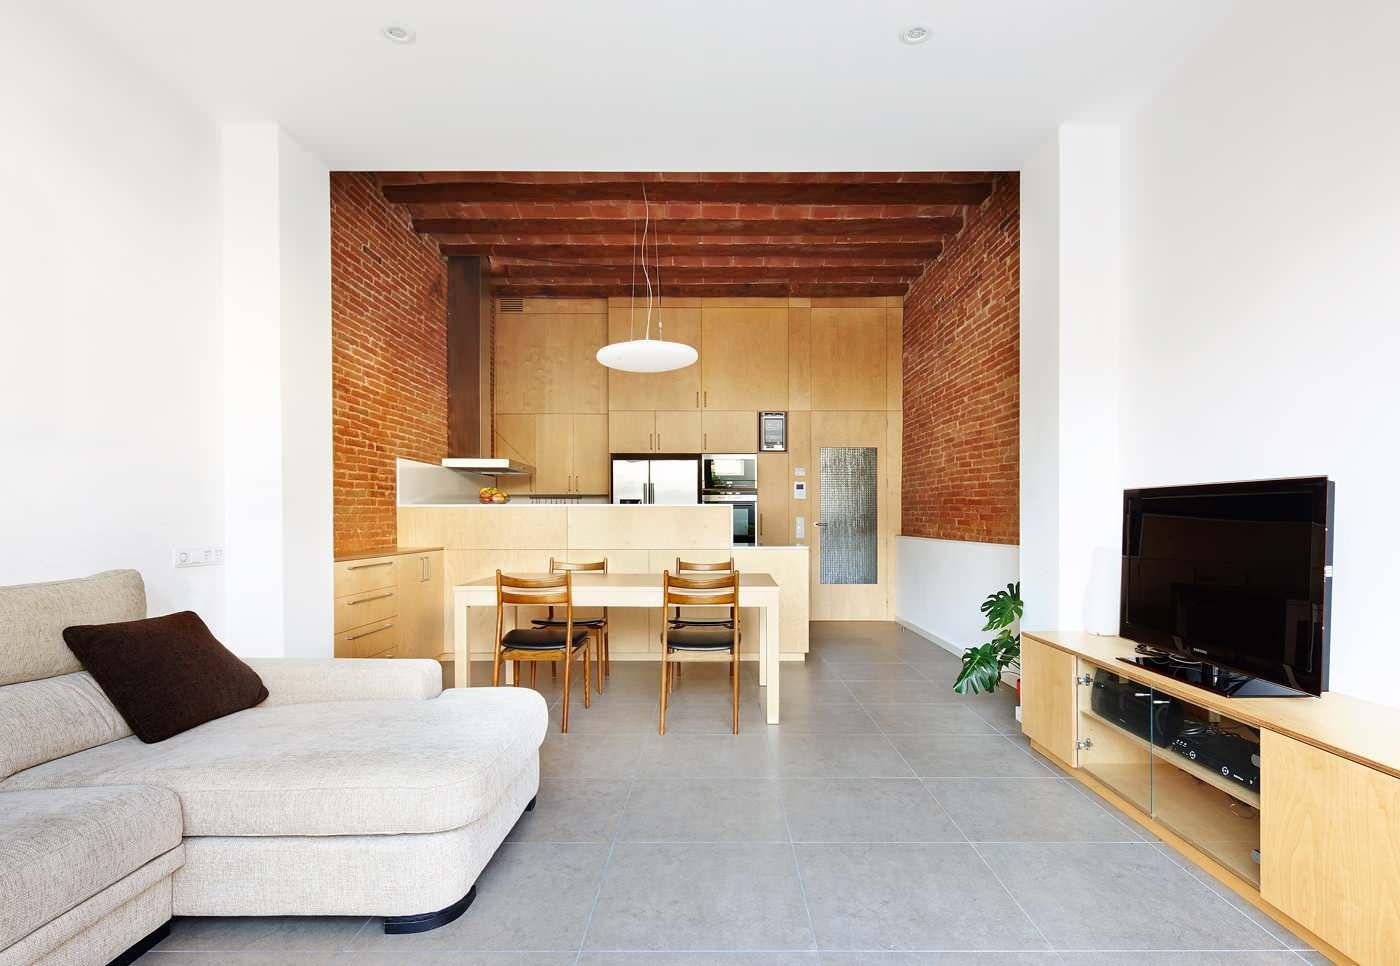 Spanish natural walls also home decor ideas muy bueno interior design rh pinterest